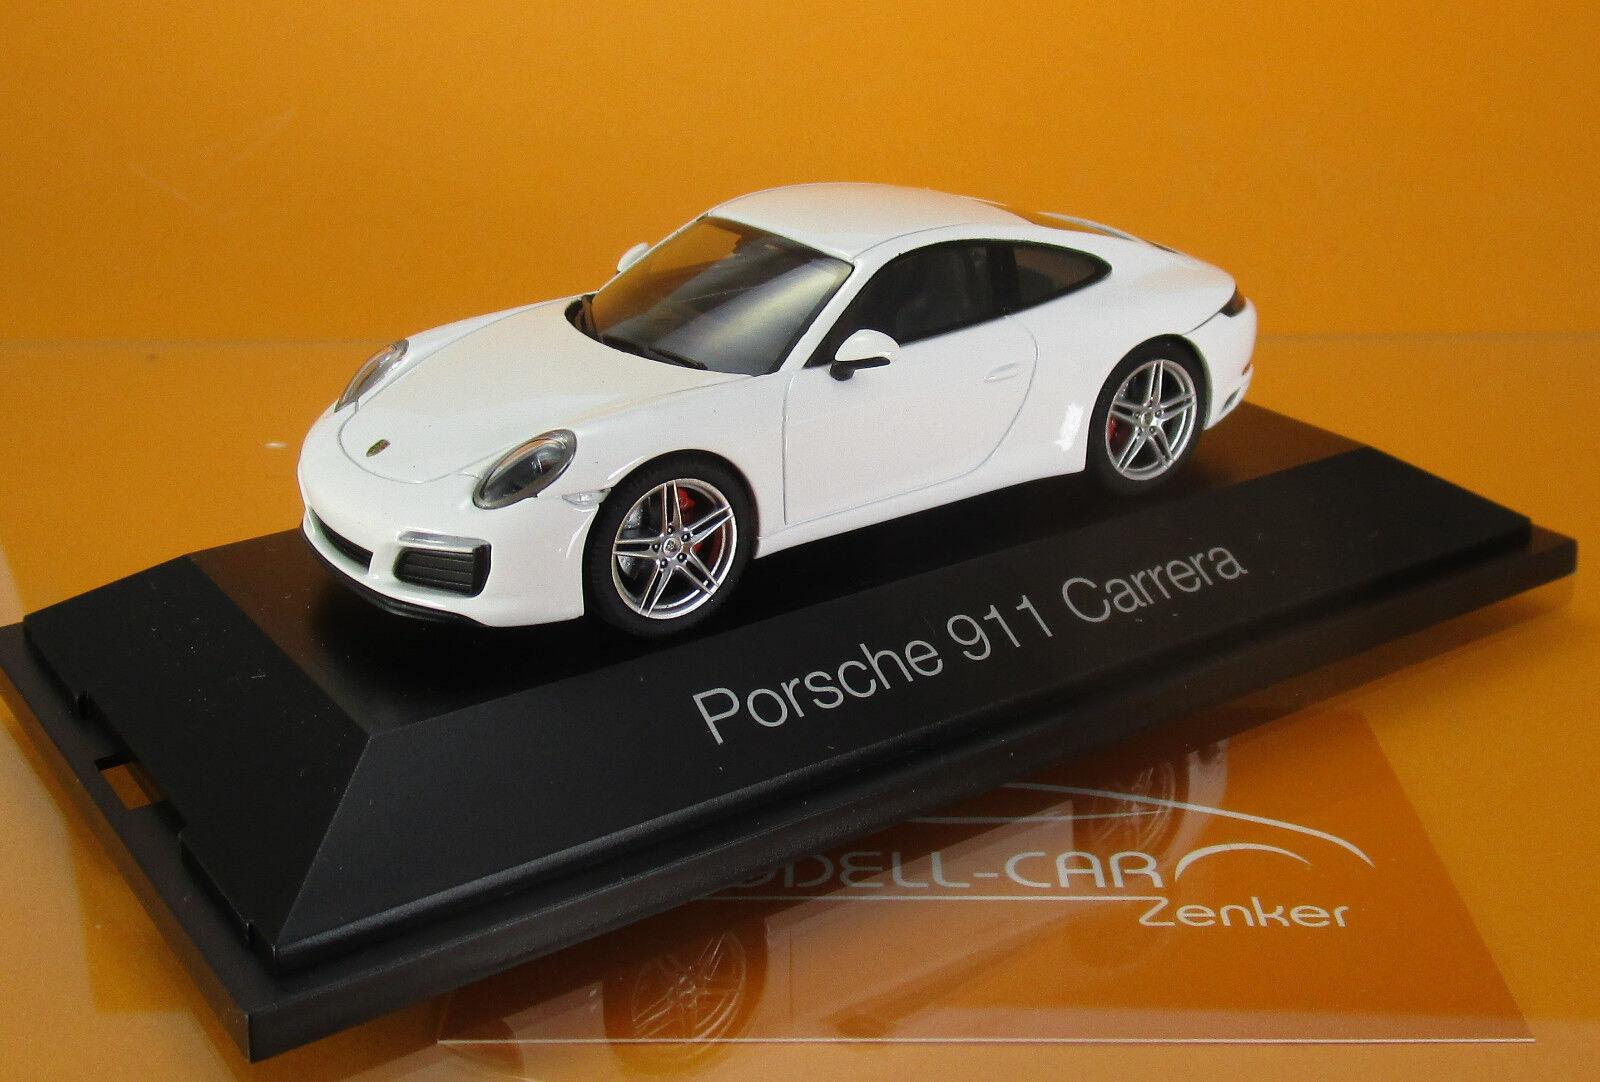 Herpa 071017 Porsche 911 Carrera Coupé 991 II carrarablanc Metallic scale 1 43